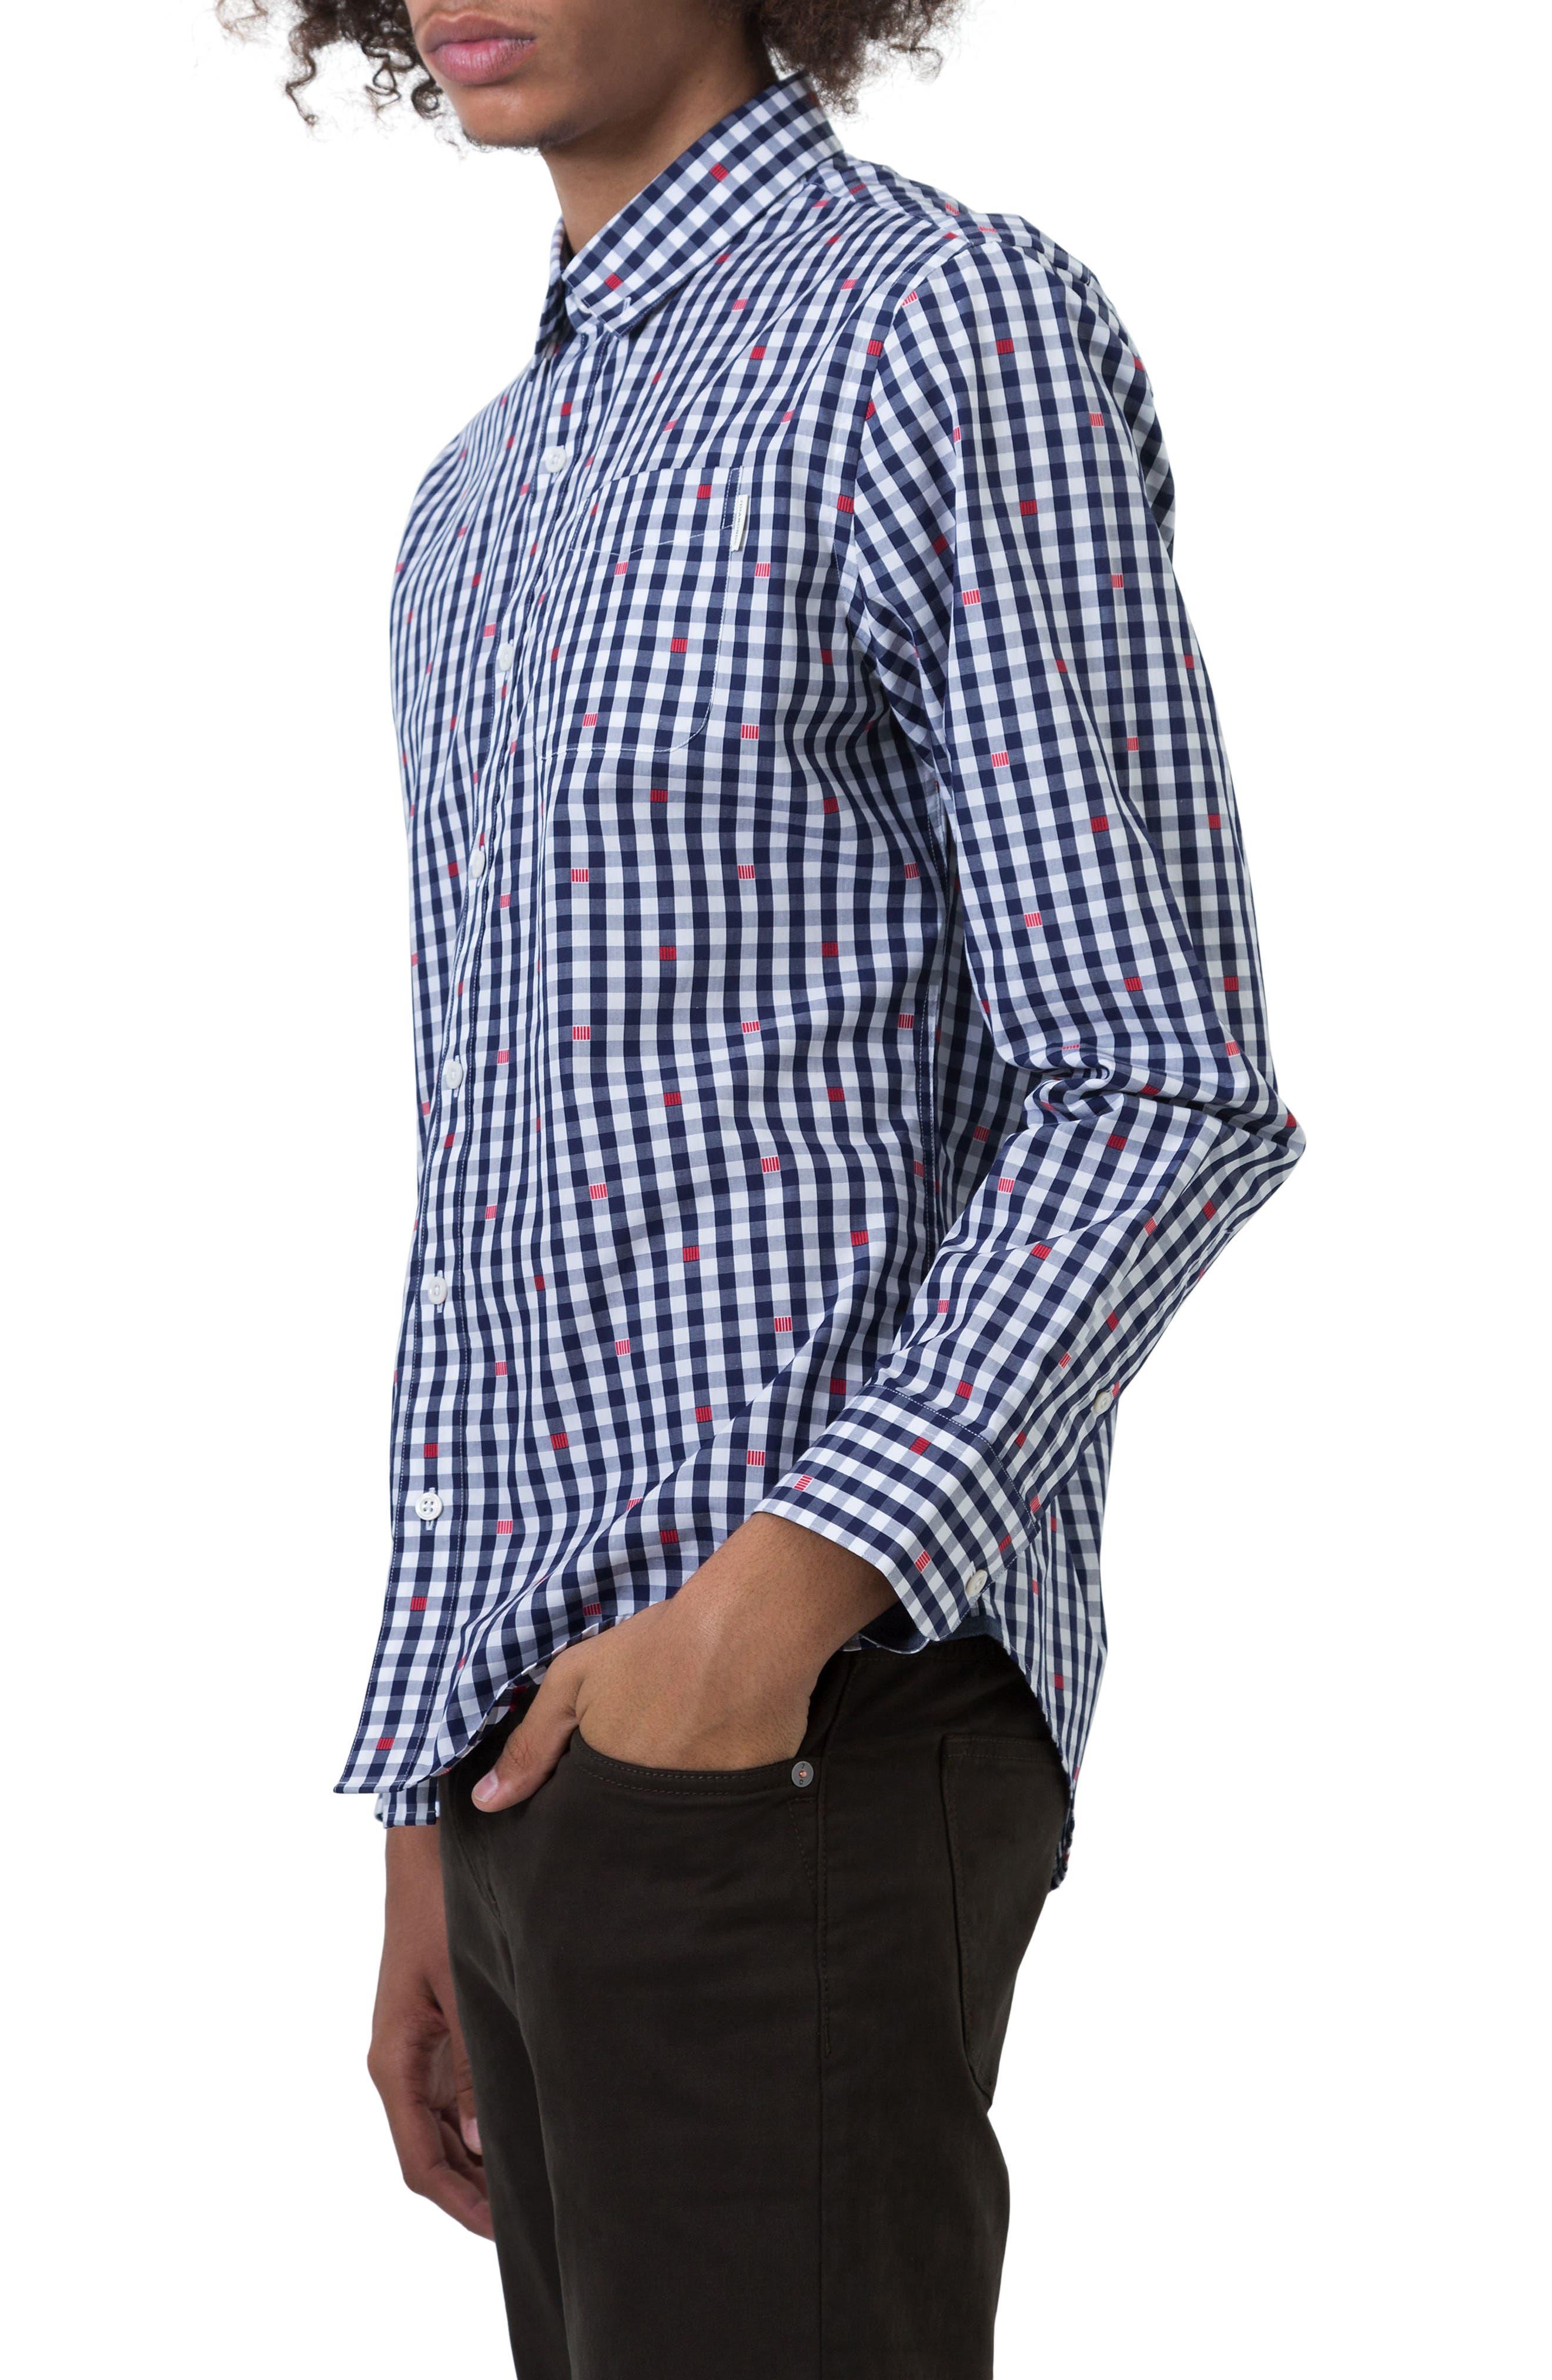 Petrichor Woven Shirt,                             Alternate thumbnail 3, color,                             410